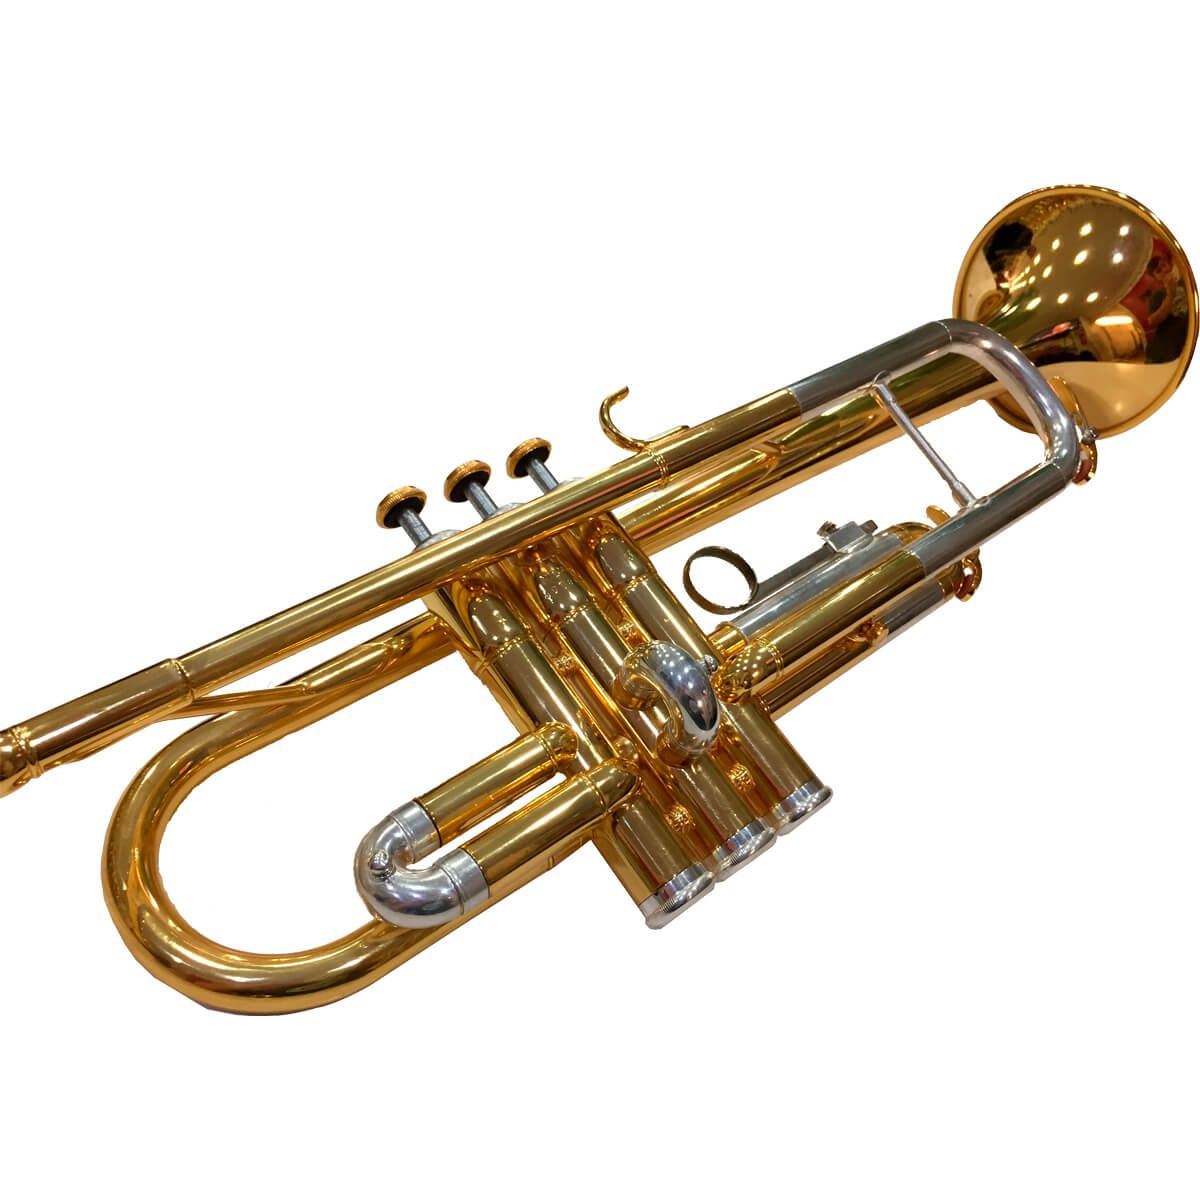 Reforma Geral De Trompete, Tuba, Bombardão, Trombone, Bombardino, Trompa, Flugelhorn E Cornet